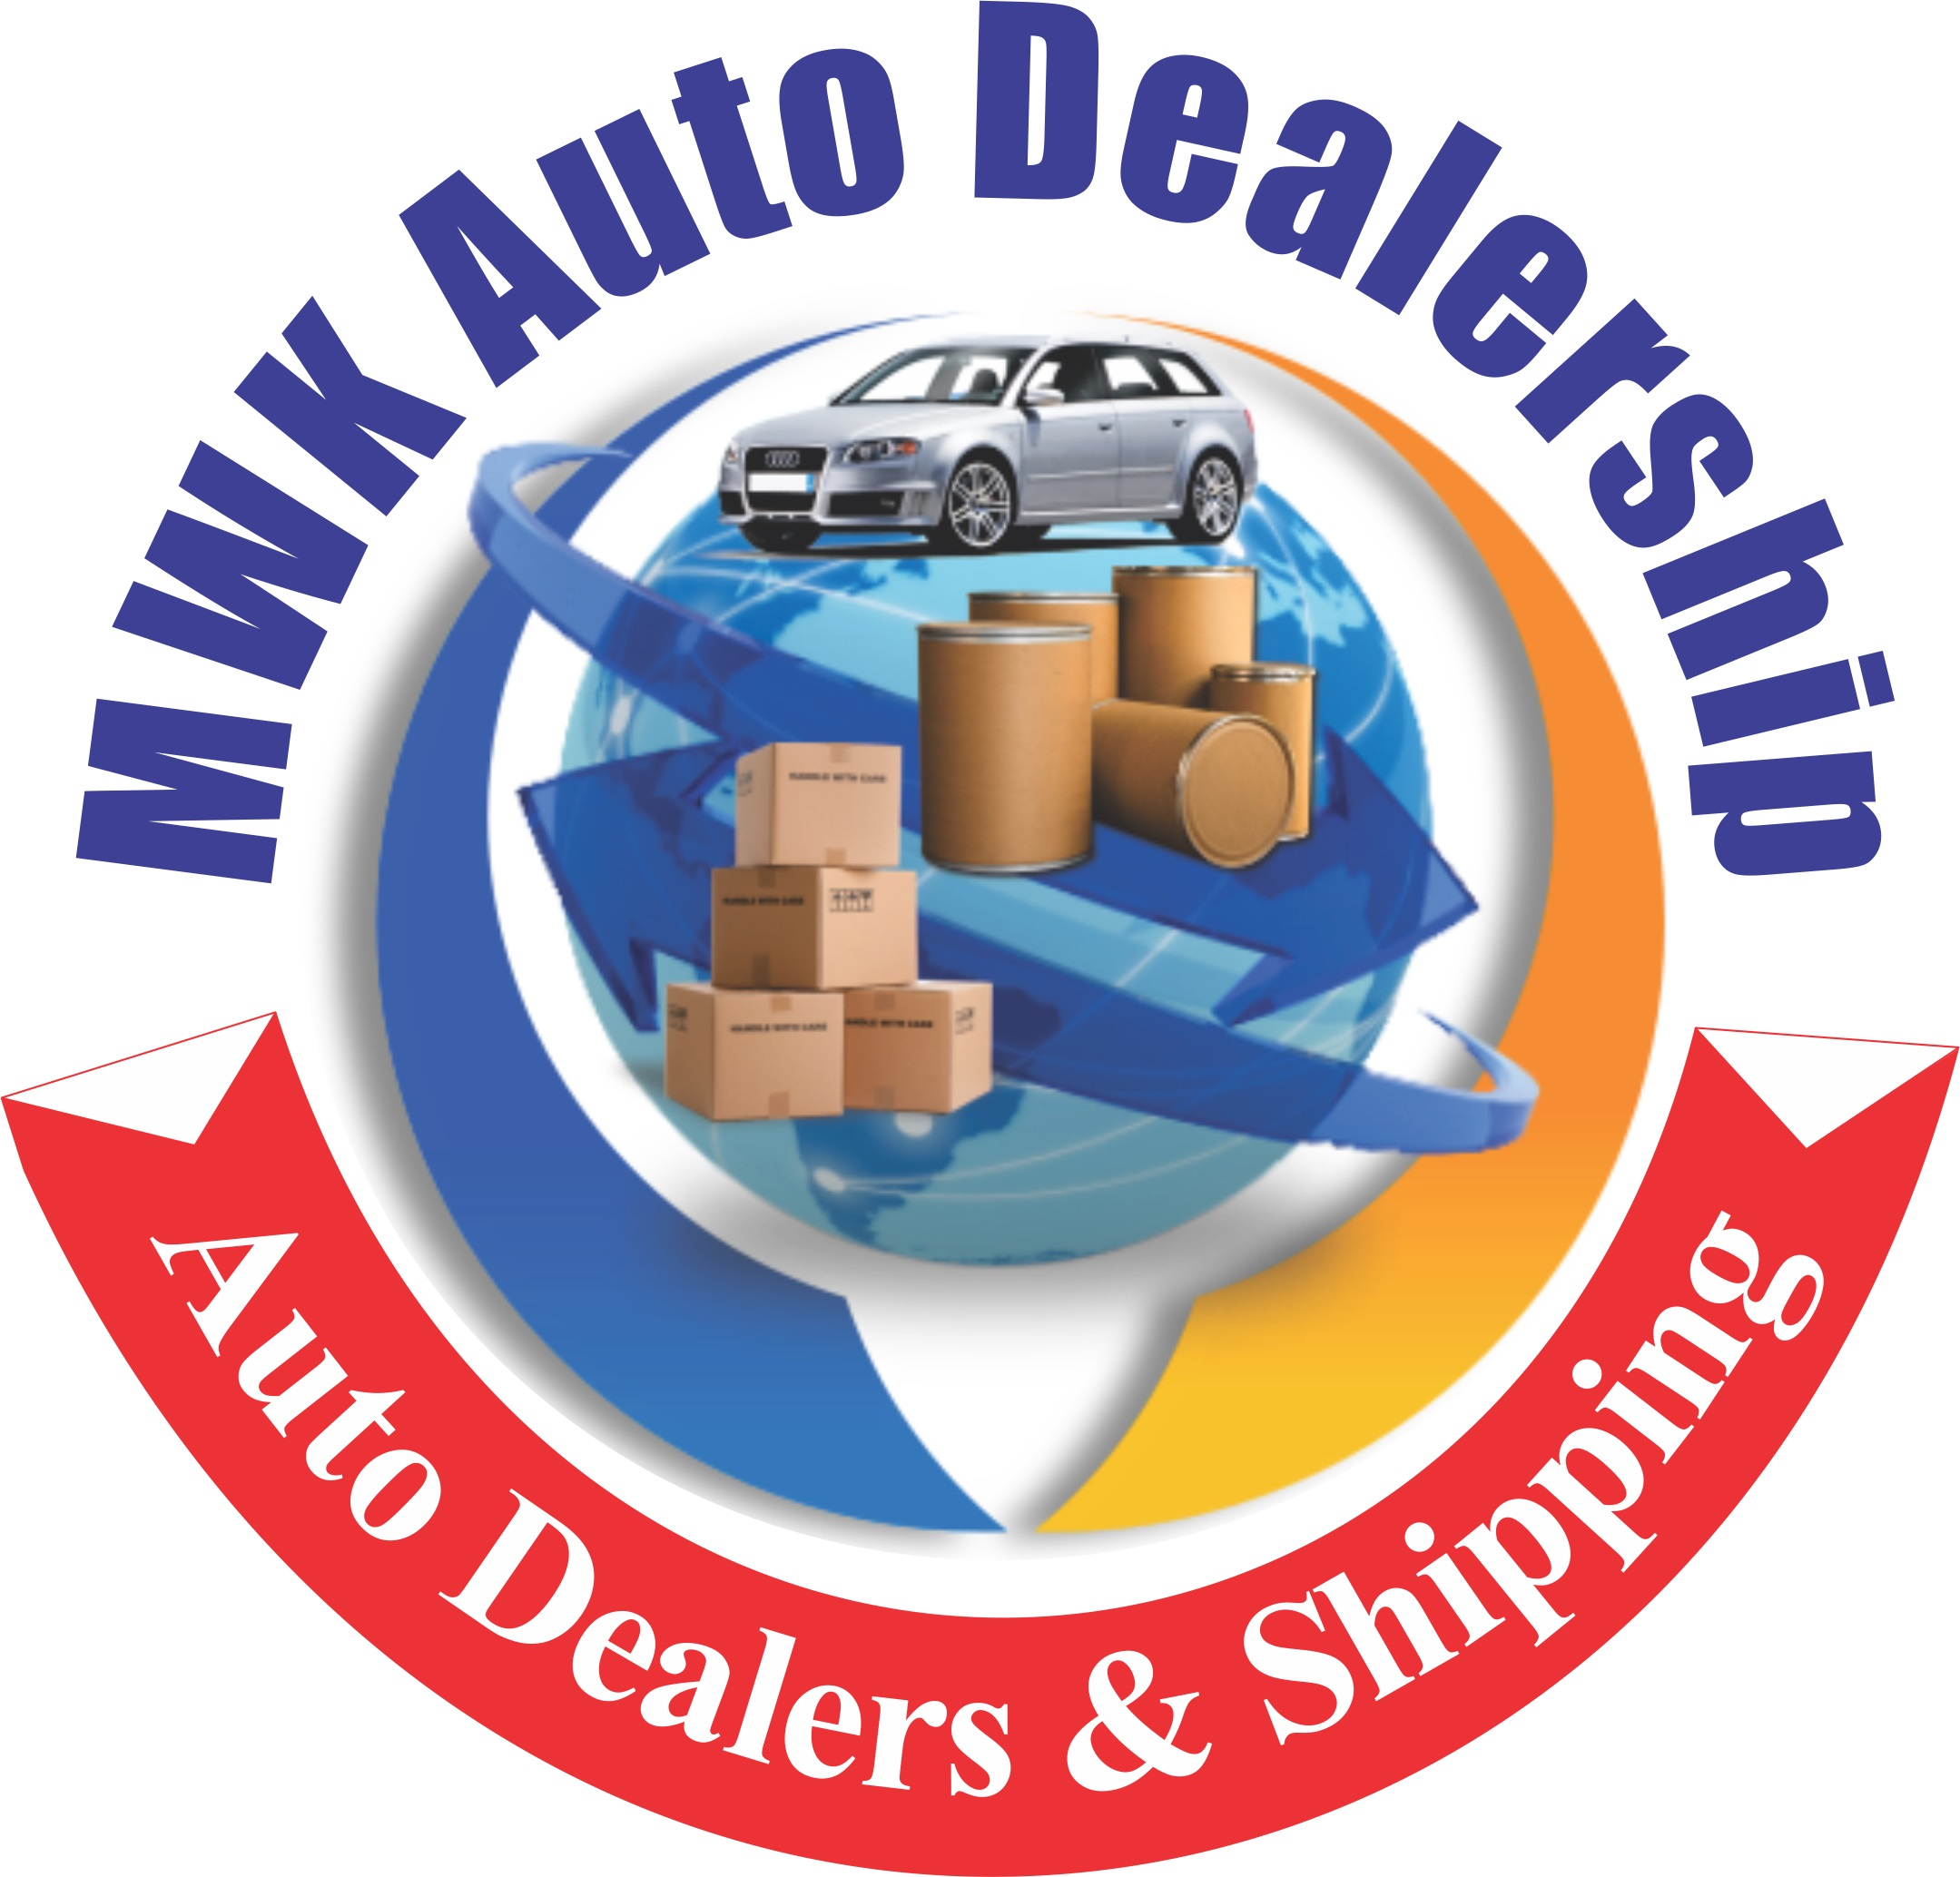 MWK AUTO DEALERS & SHIPPING LLC